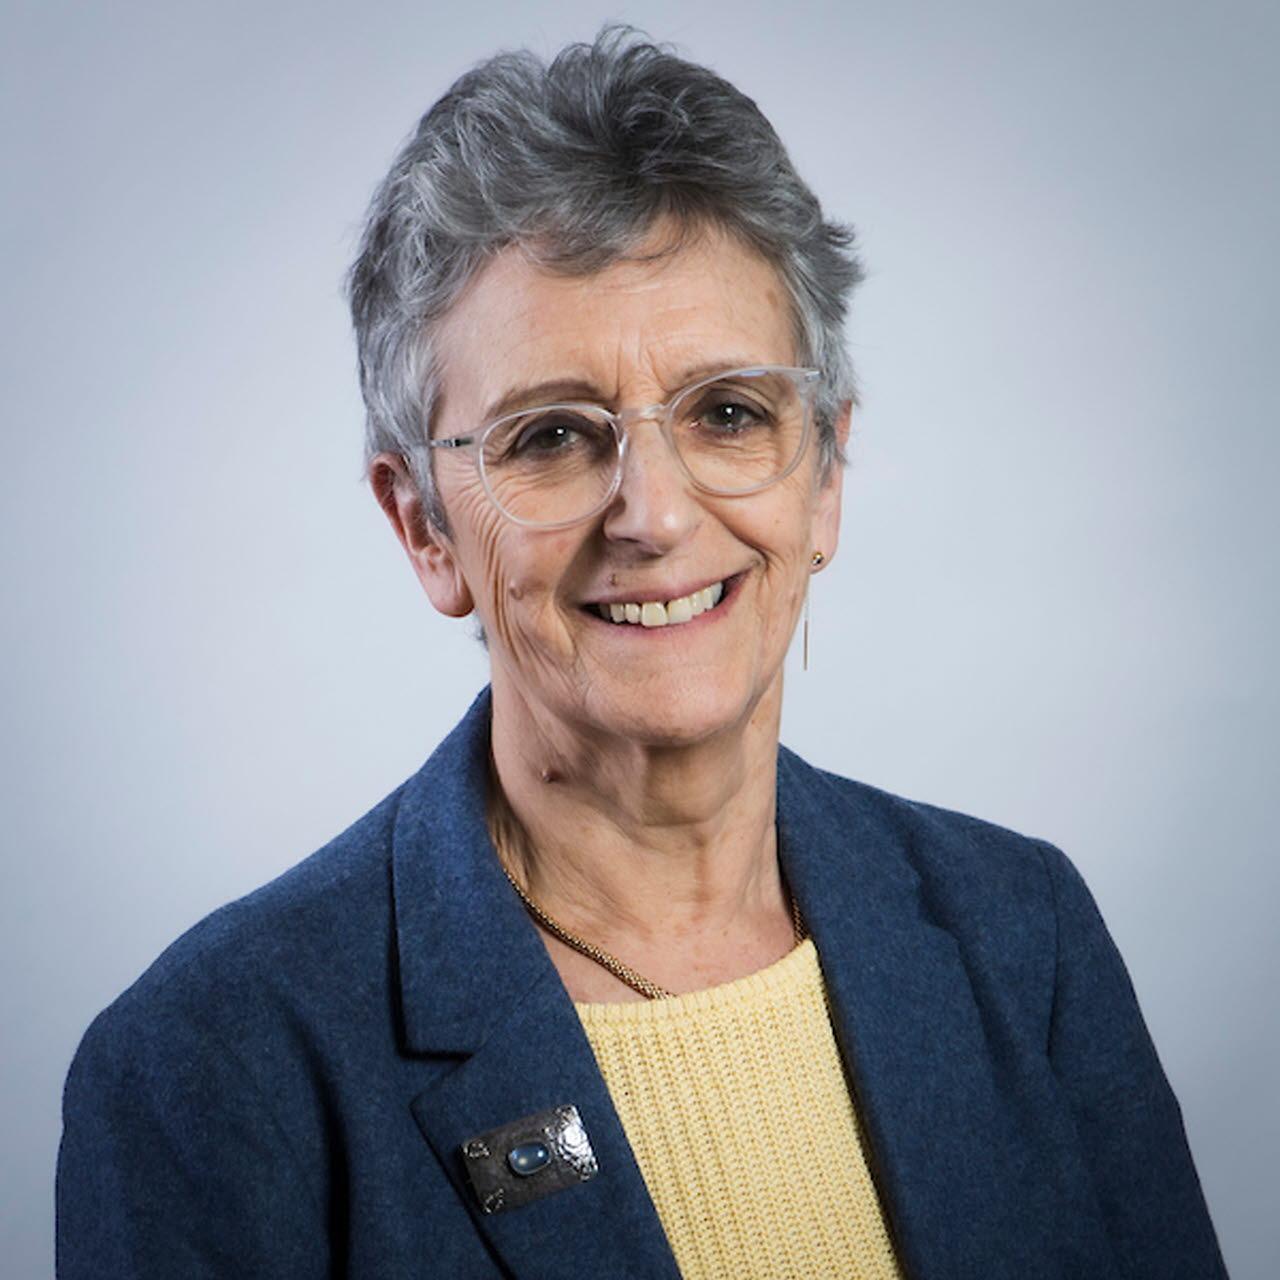 Janet Paraskeva